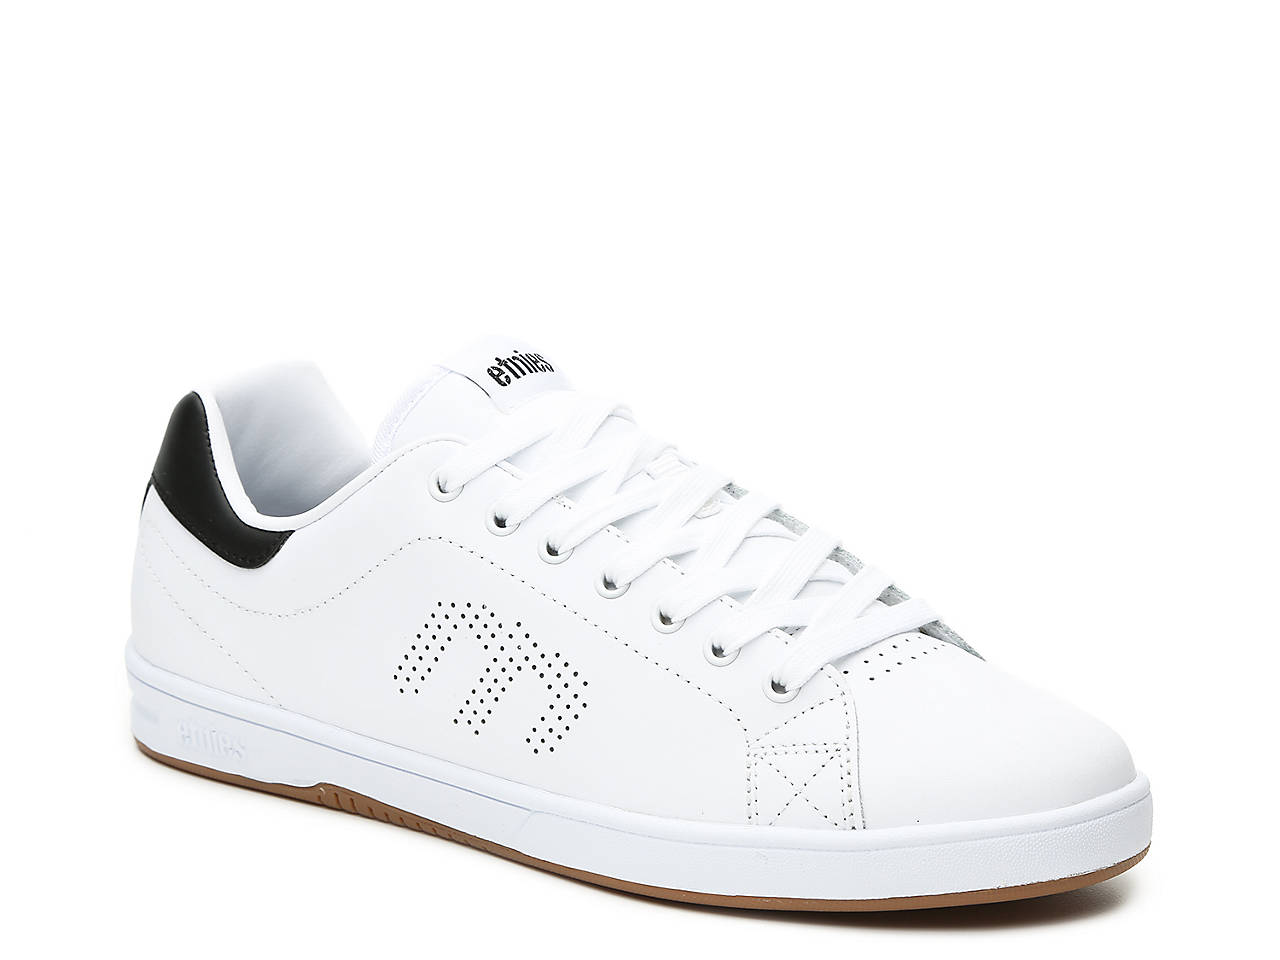 38242c2b1a035 Callicut Sneaker - Men's